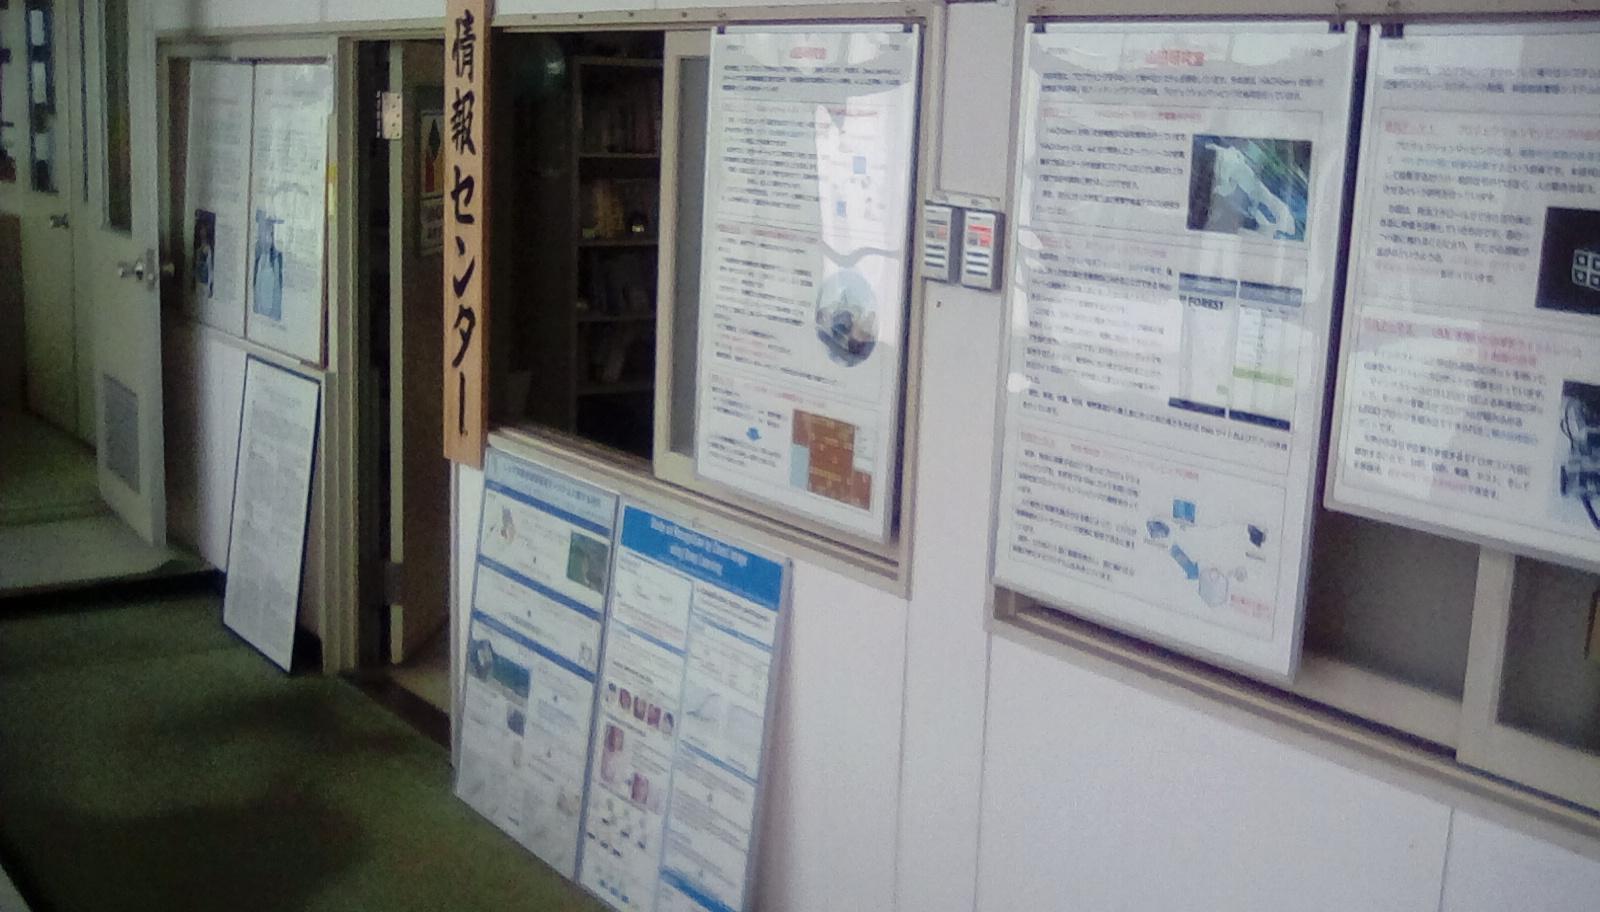 ― 山田研究室の入口 ―